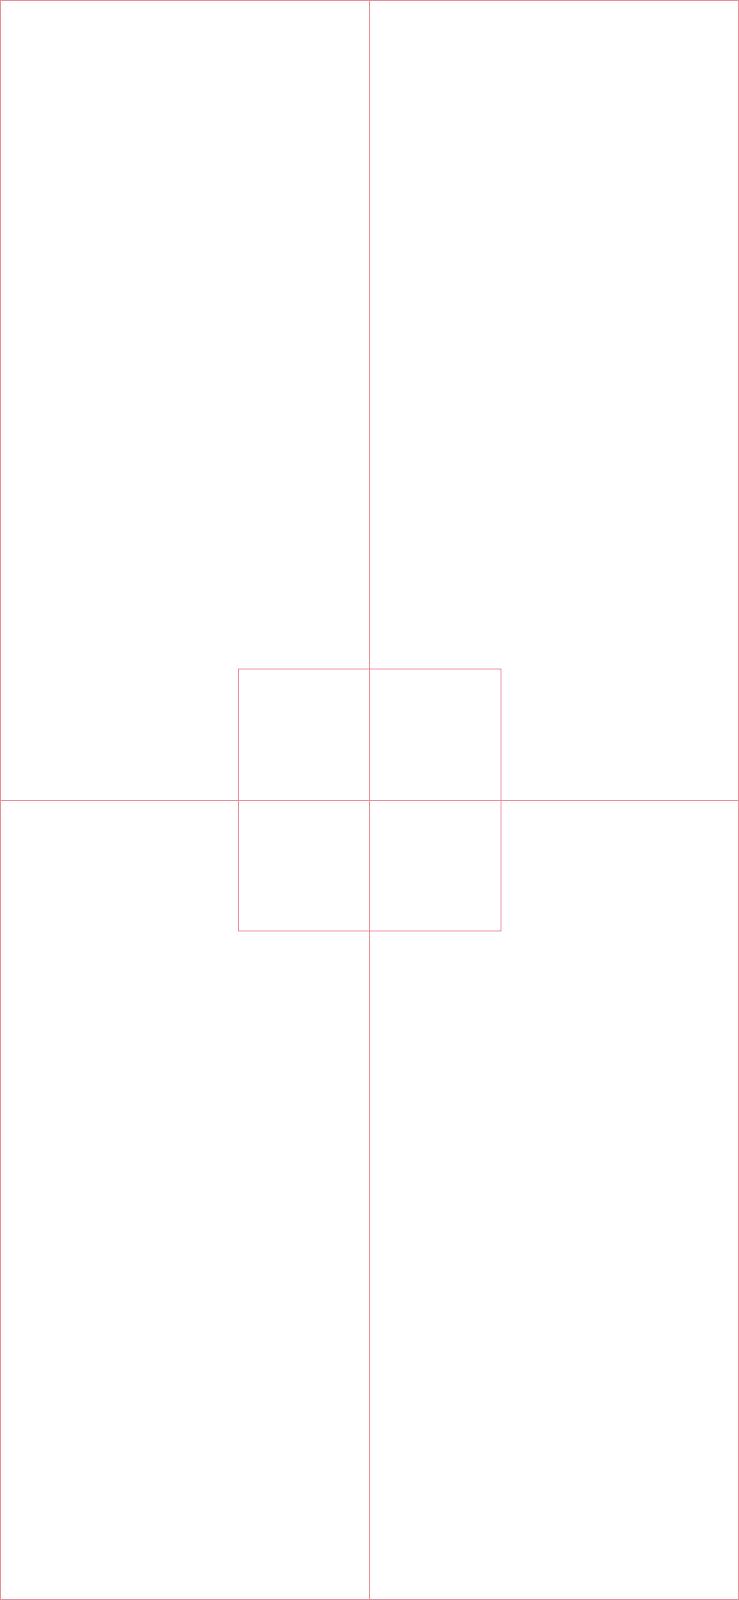 Iphone Xの視差効果の壁紙サイズとホーム画面 不思議なiphone壁紙のブログ